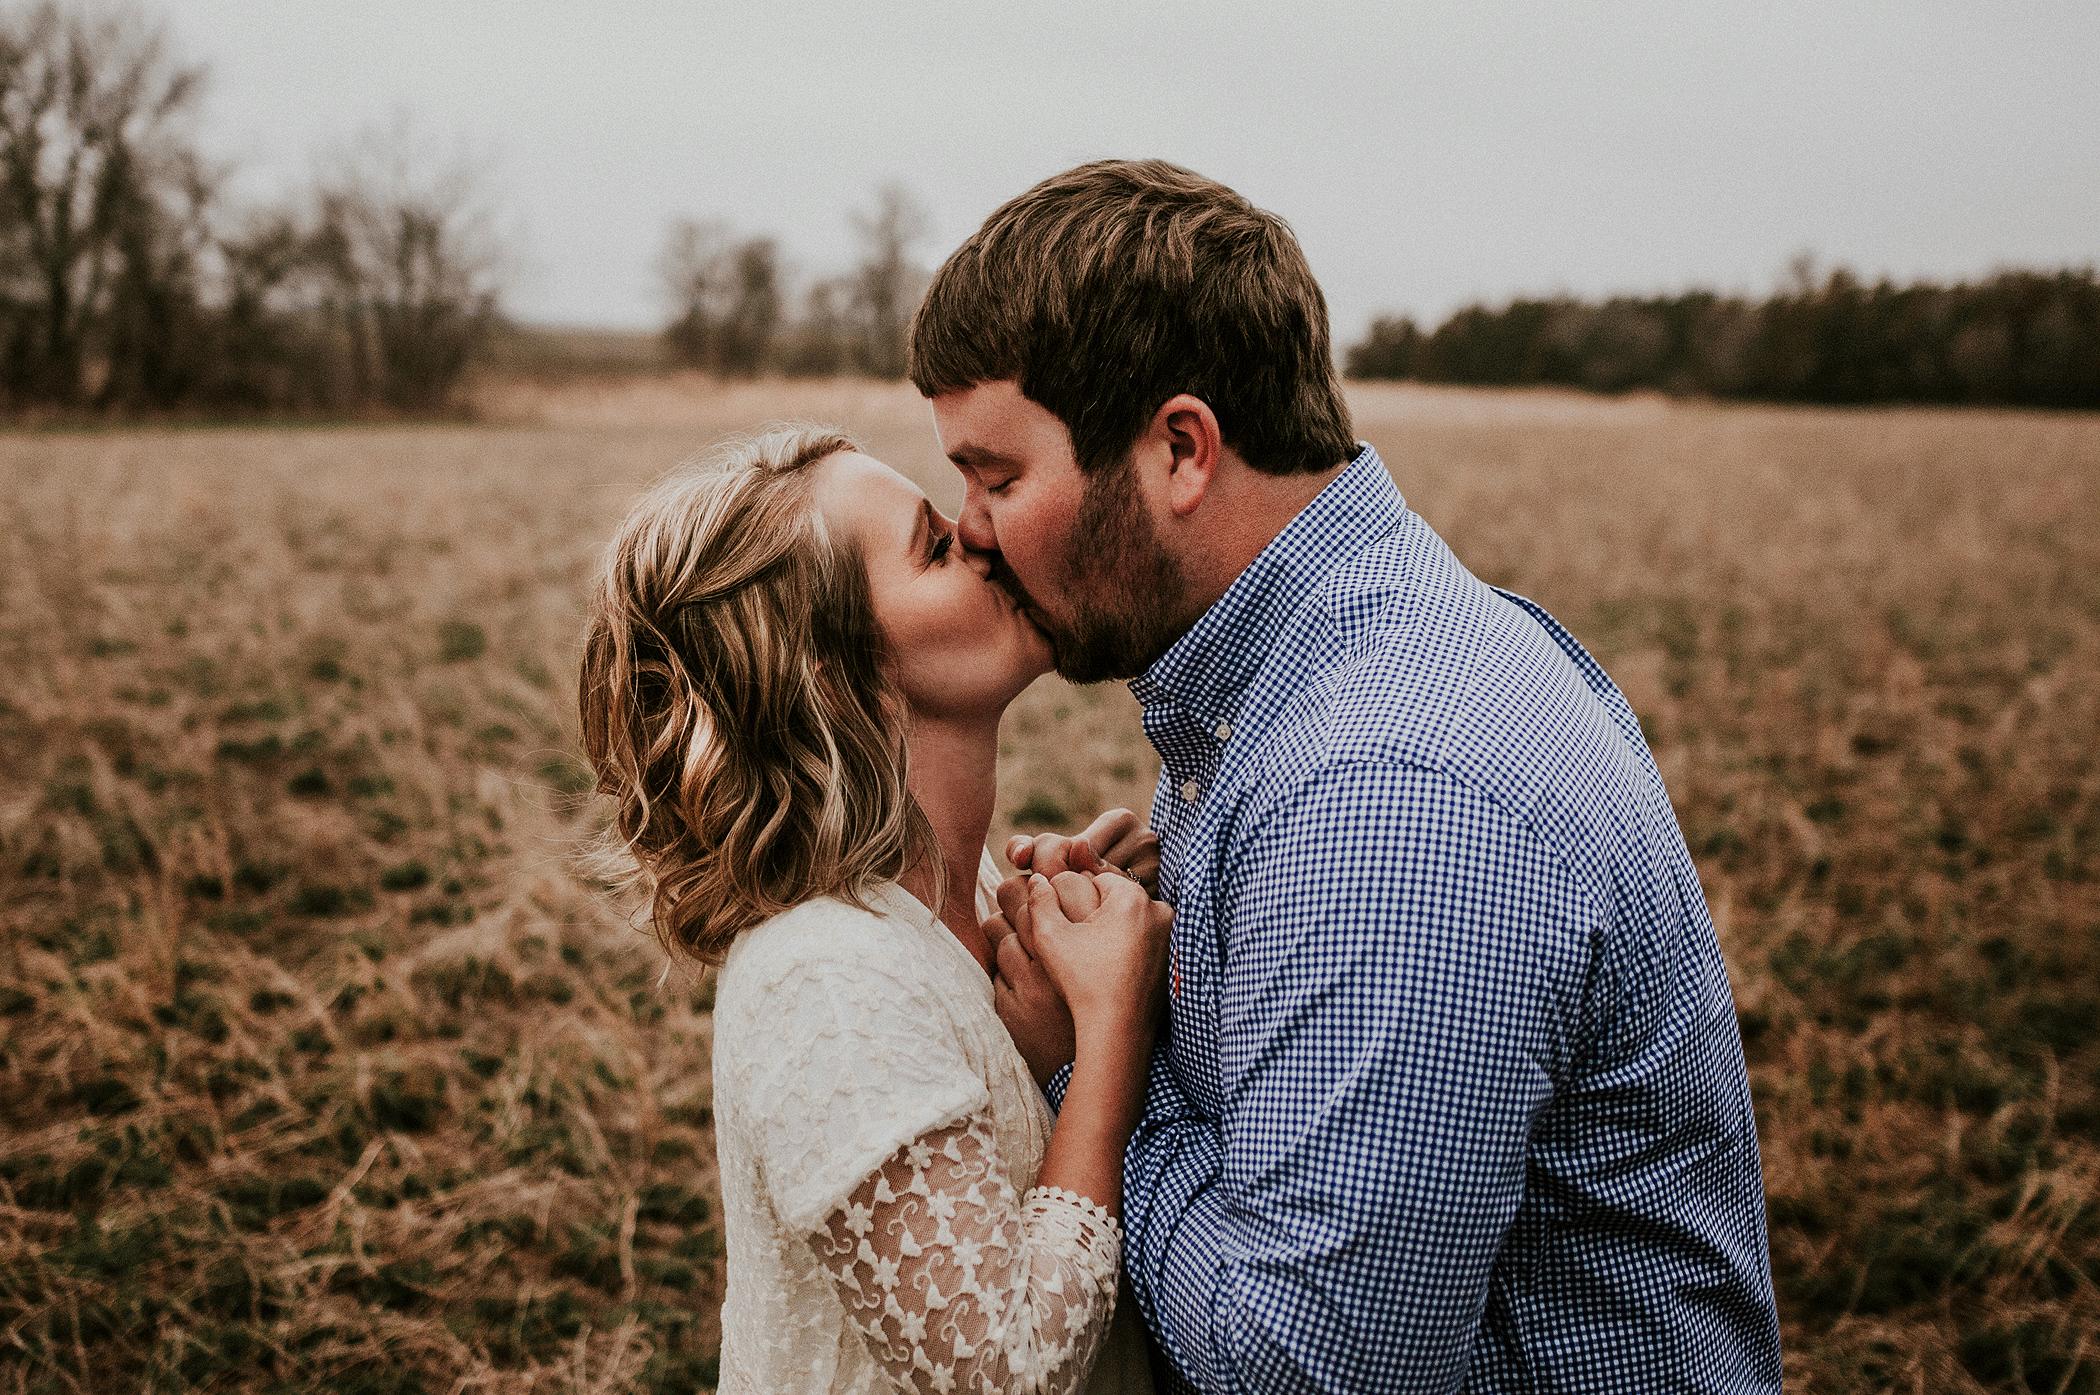 kaylie-sirek-nebraska-wedding-engagement-photographer-photography-grand-island-kearney-hastings-lincoln-09.png